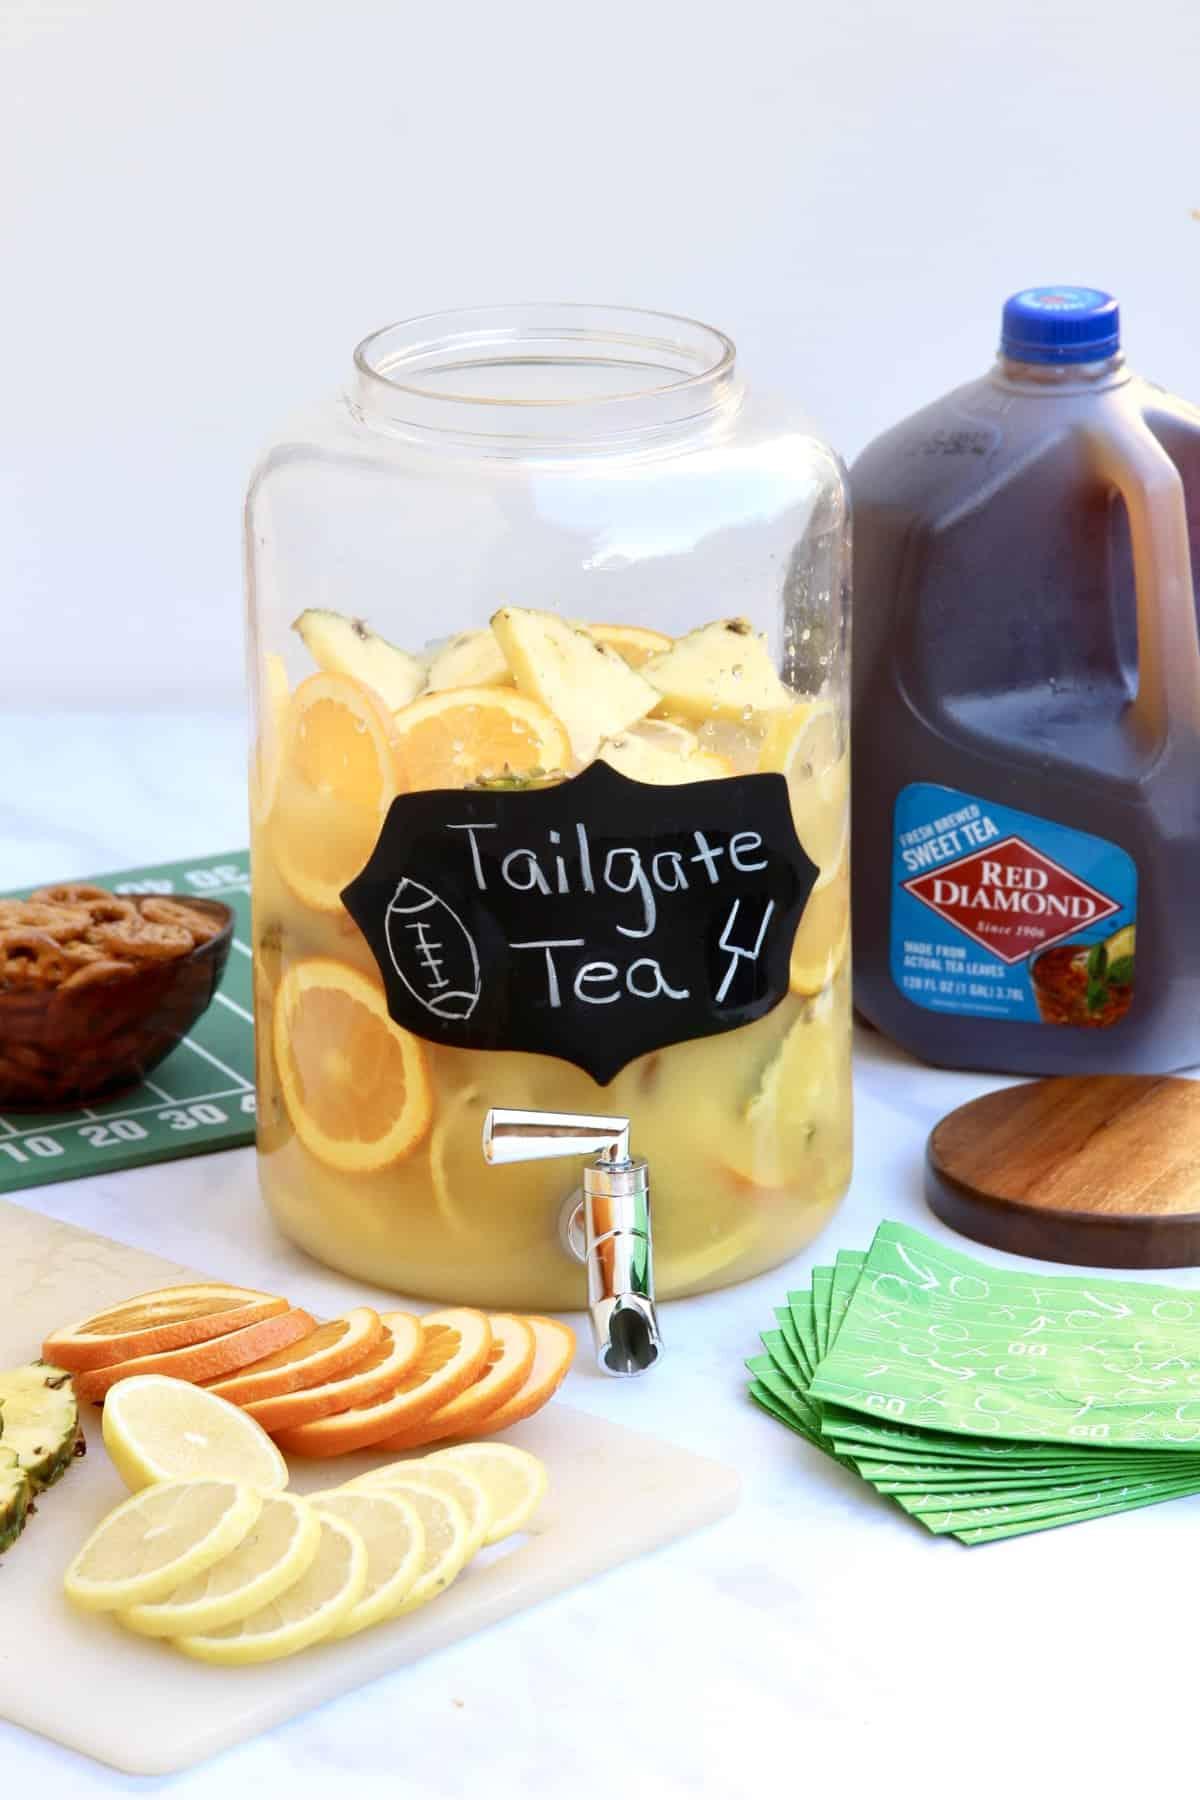 Tailgate Tea